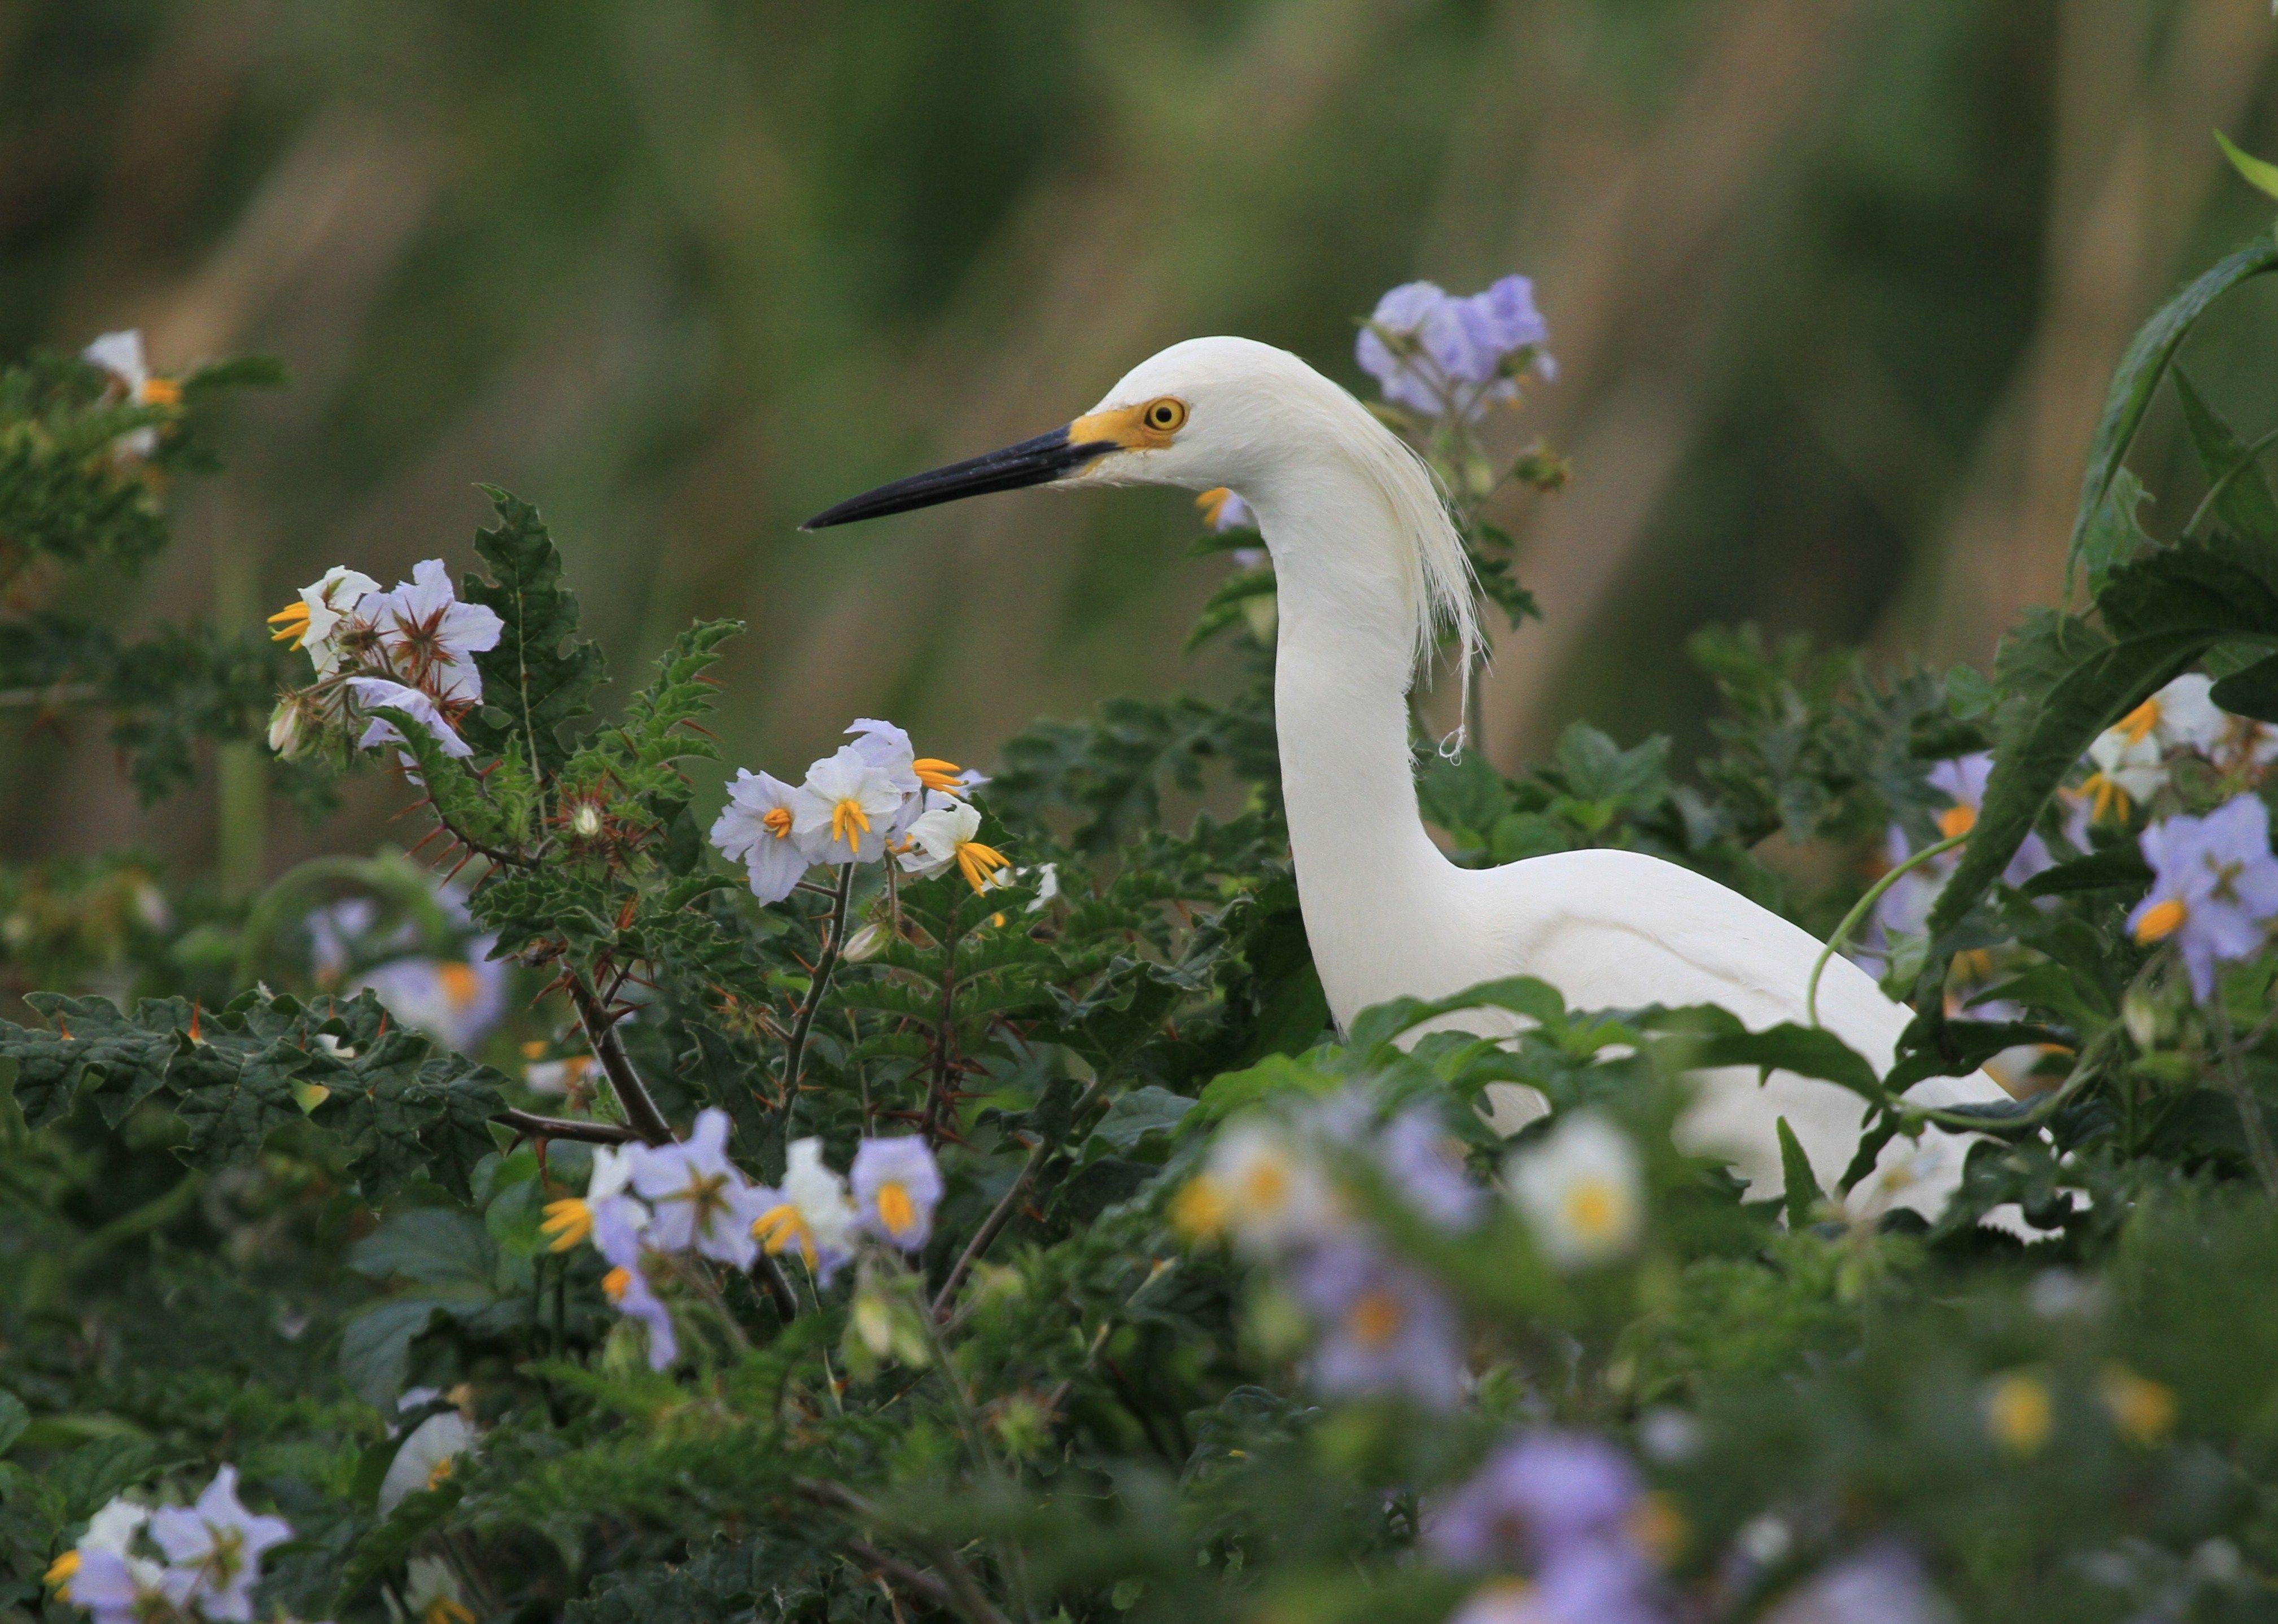 Snowy Egret on Goat Island in Mobile Bay